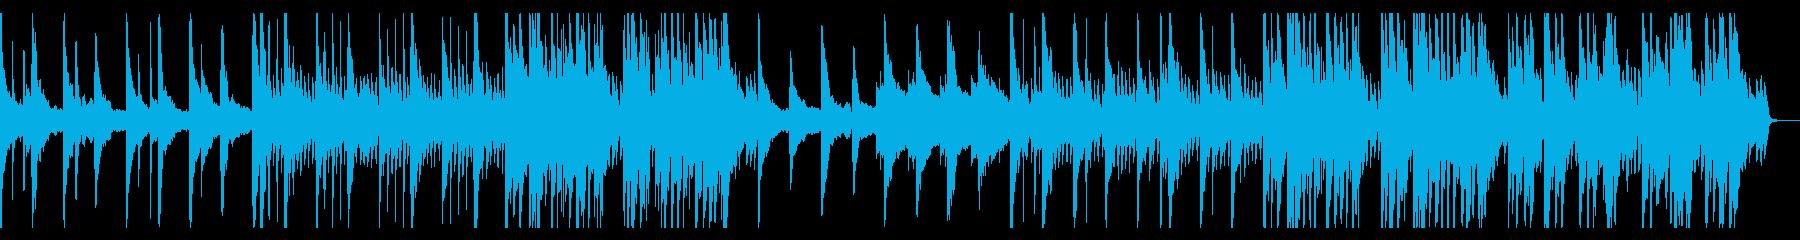 memory. R & B_3's reproduced waveform